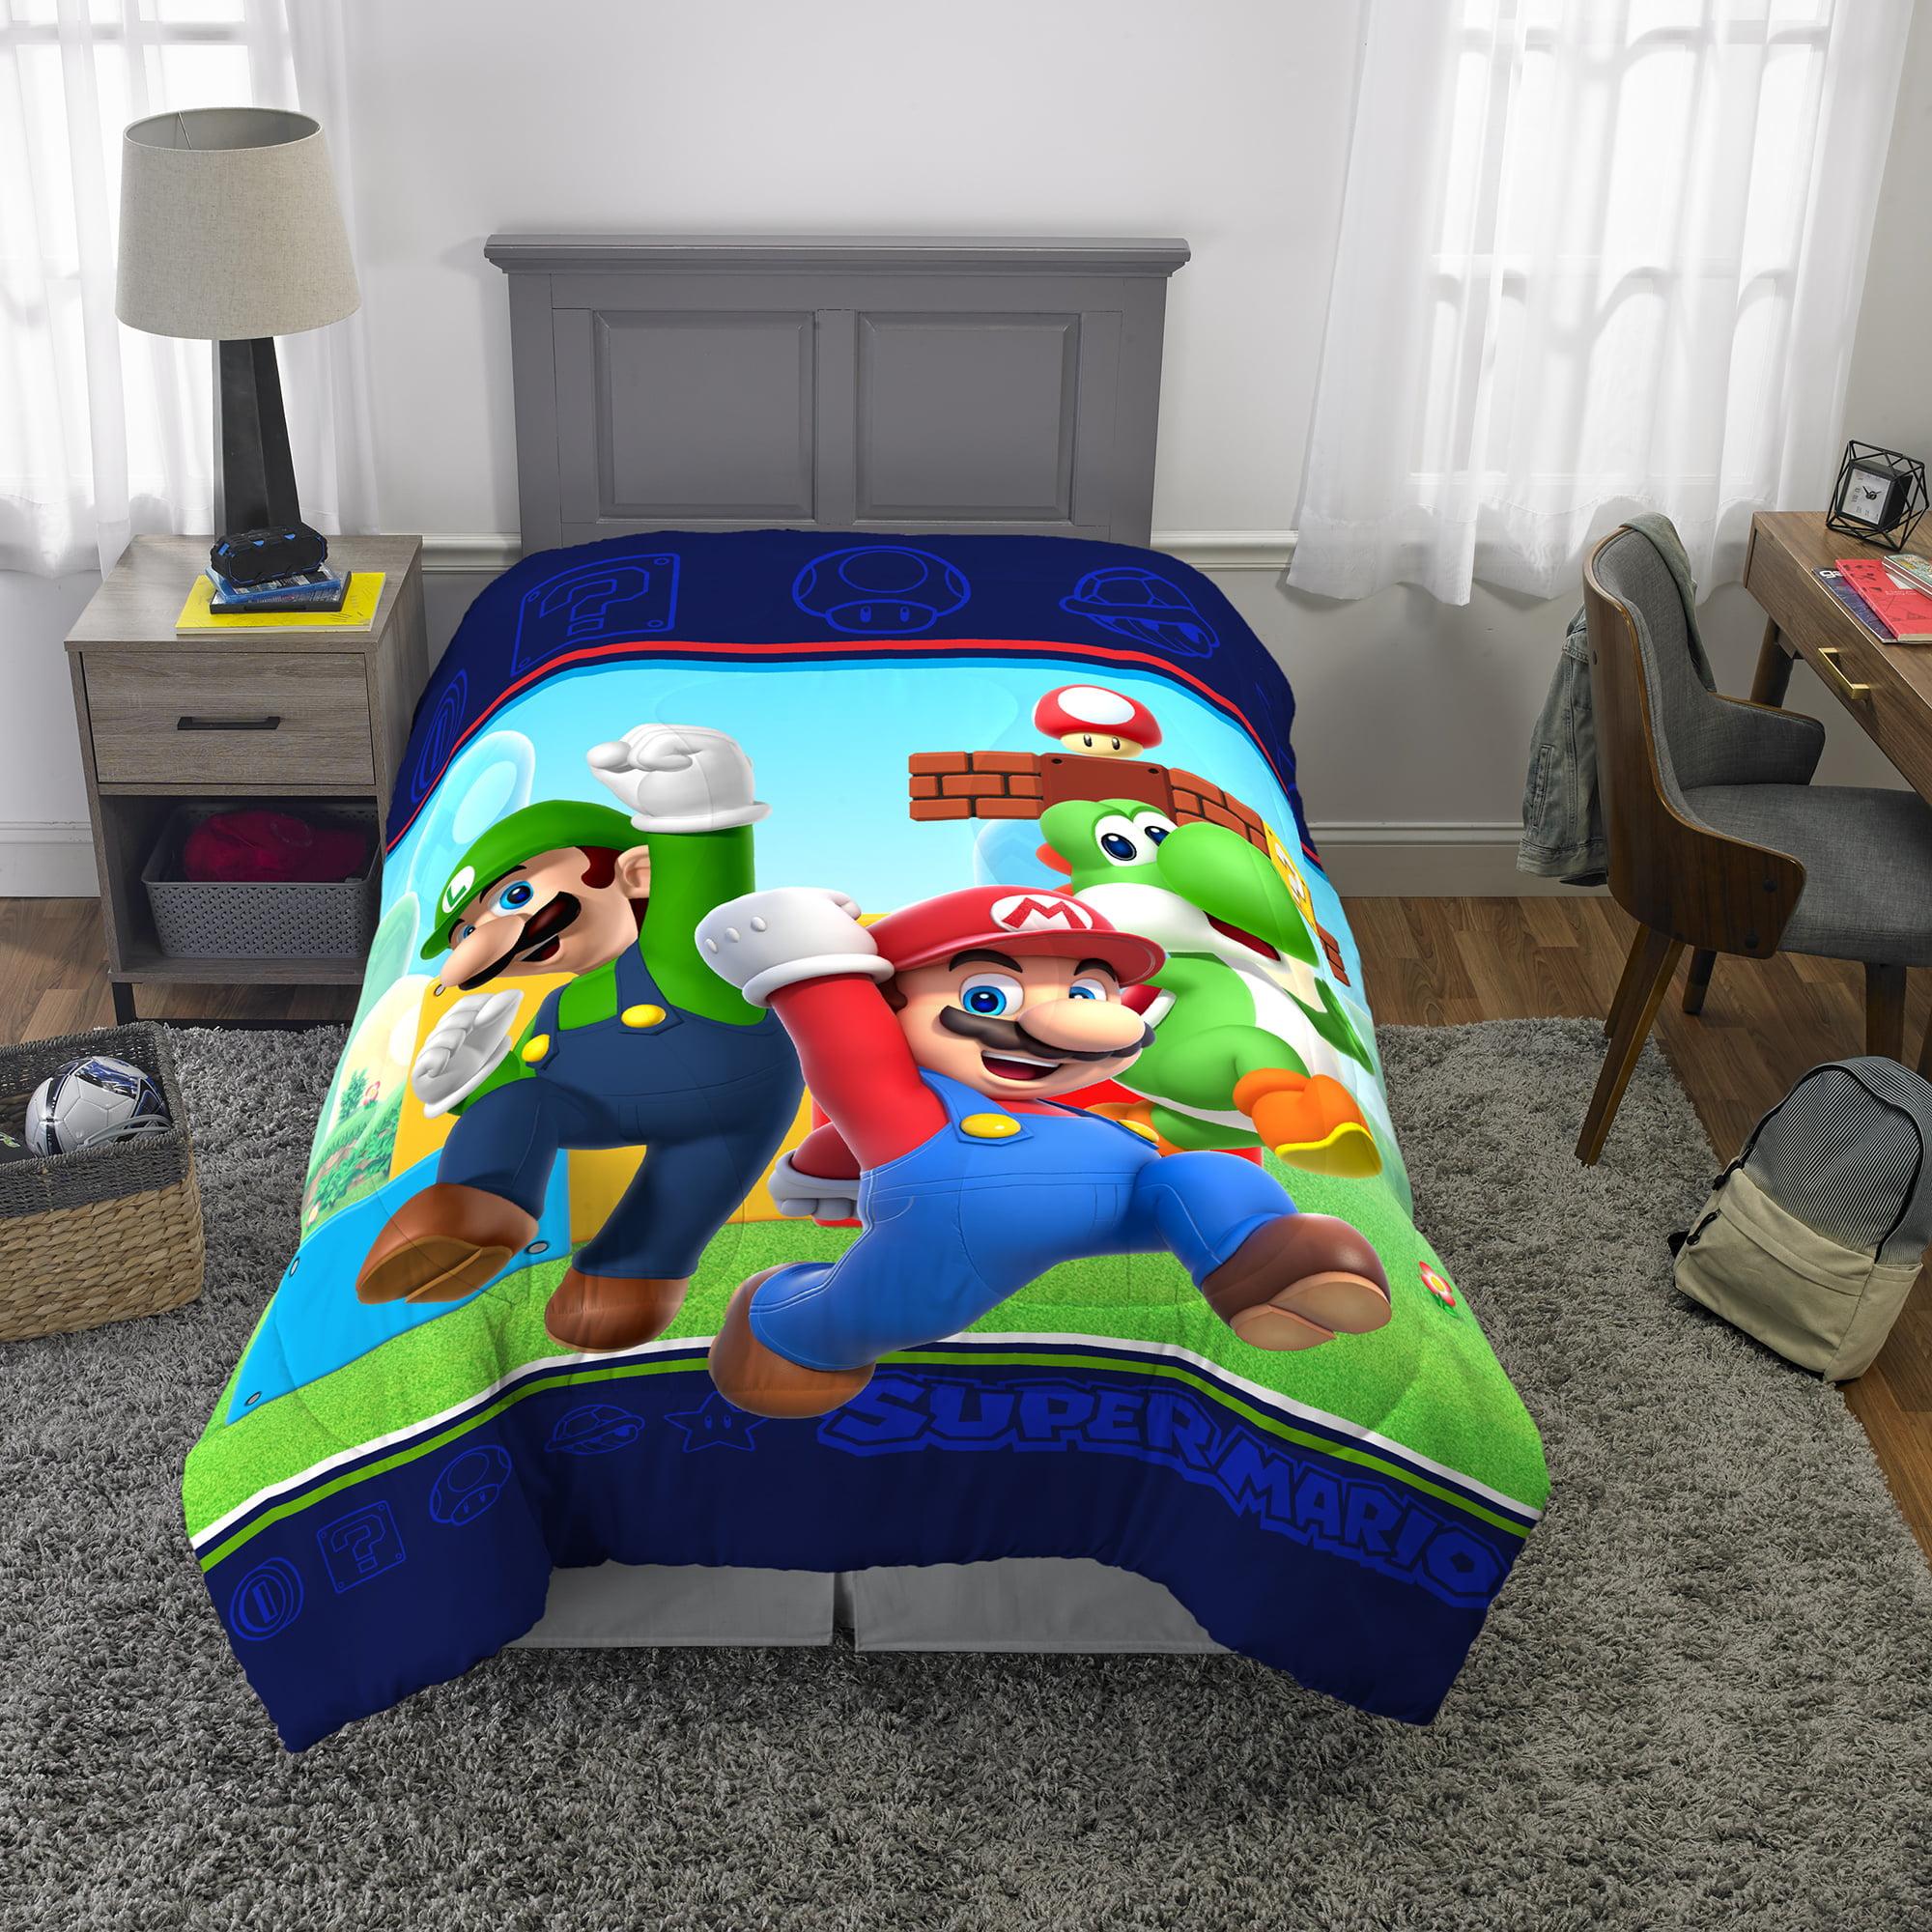 Super Mario Microfiber Comforter Kids Bedding Mario Luigi And Yoshi Twin Walmart Com Walmart Com